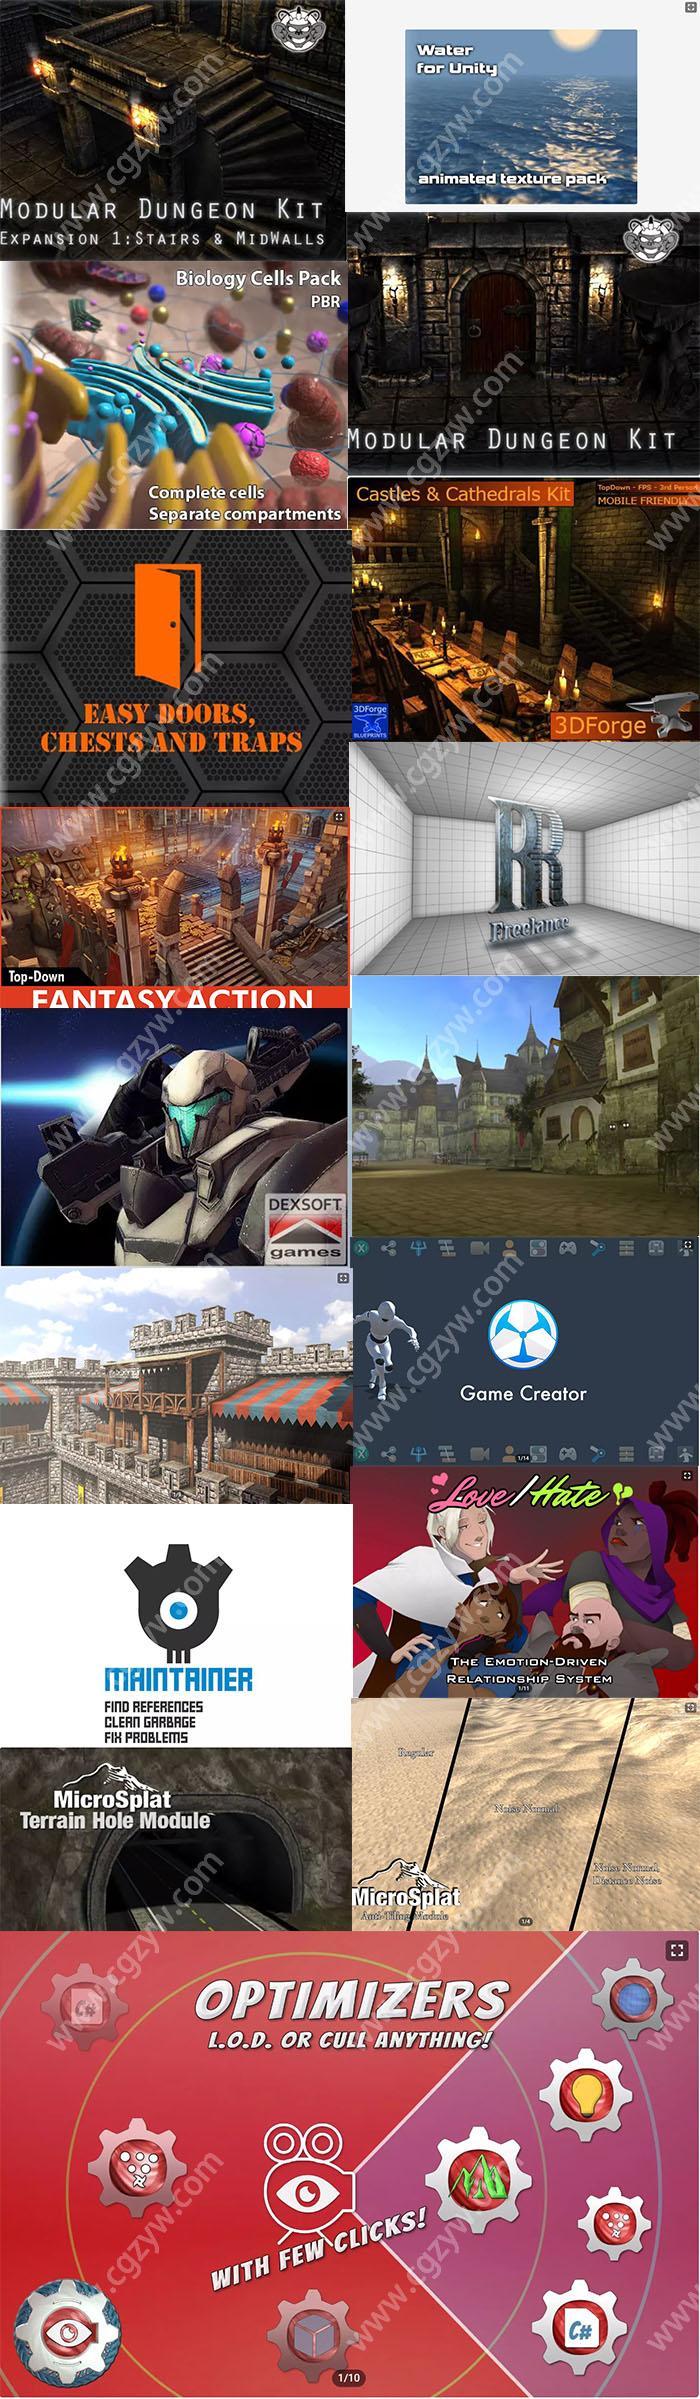 Unity游戏资源素材2020年5月合集第一波